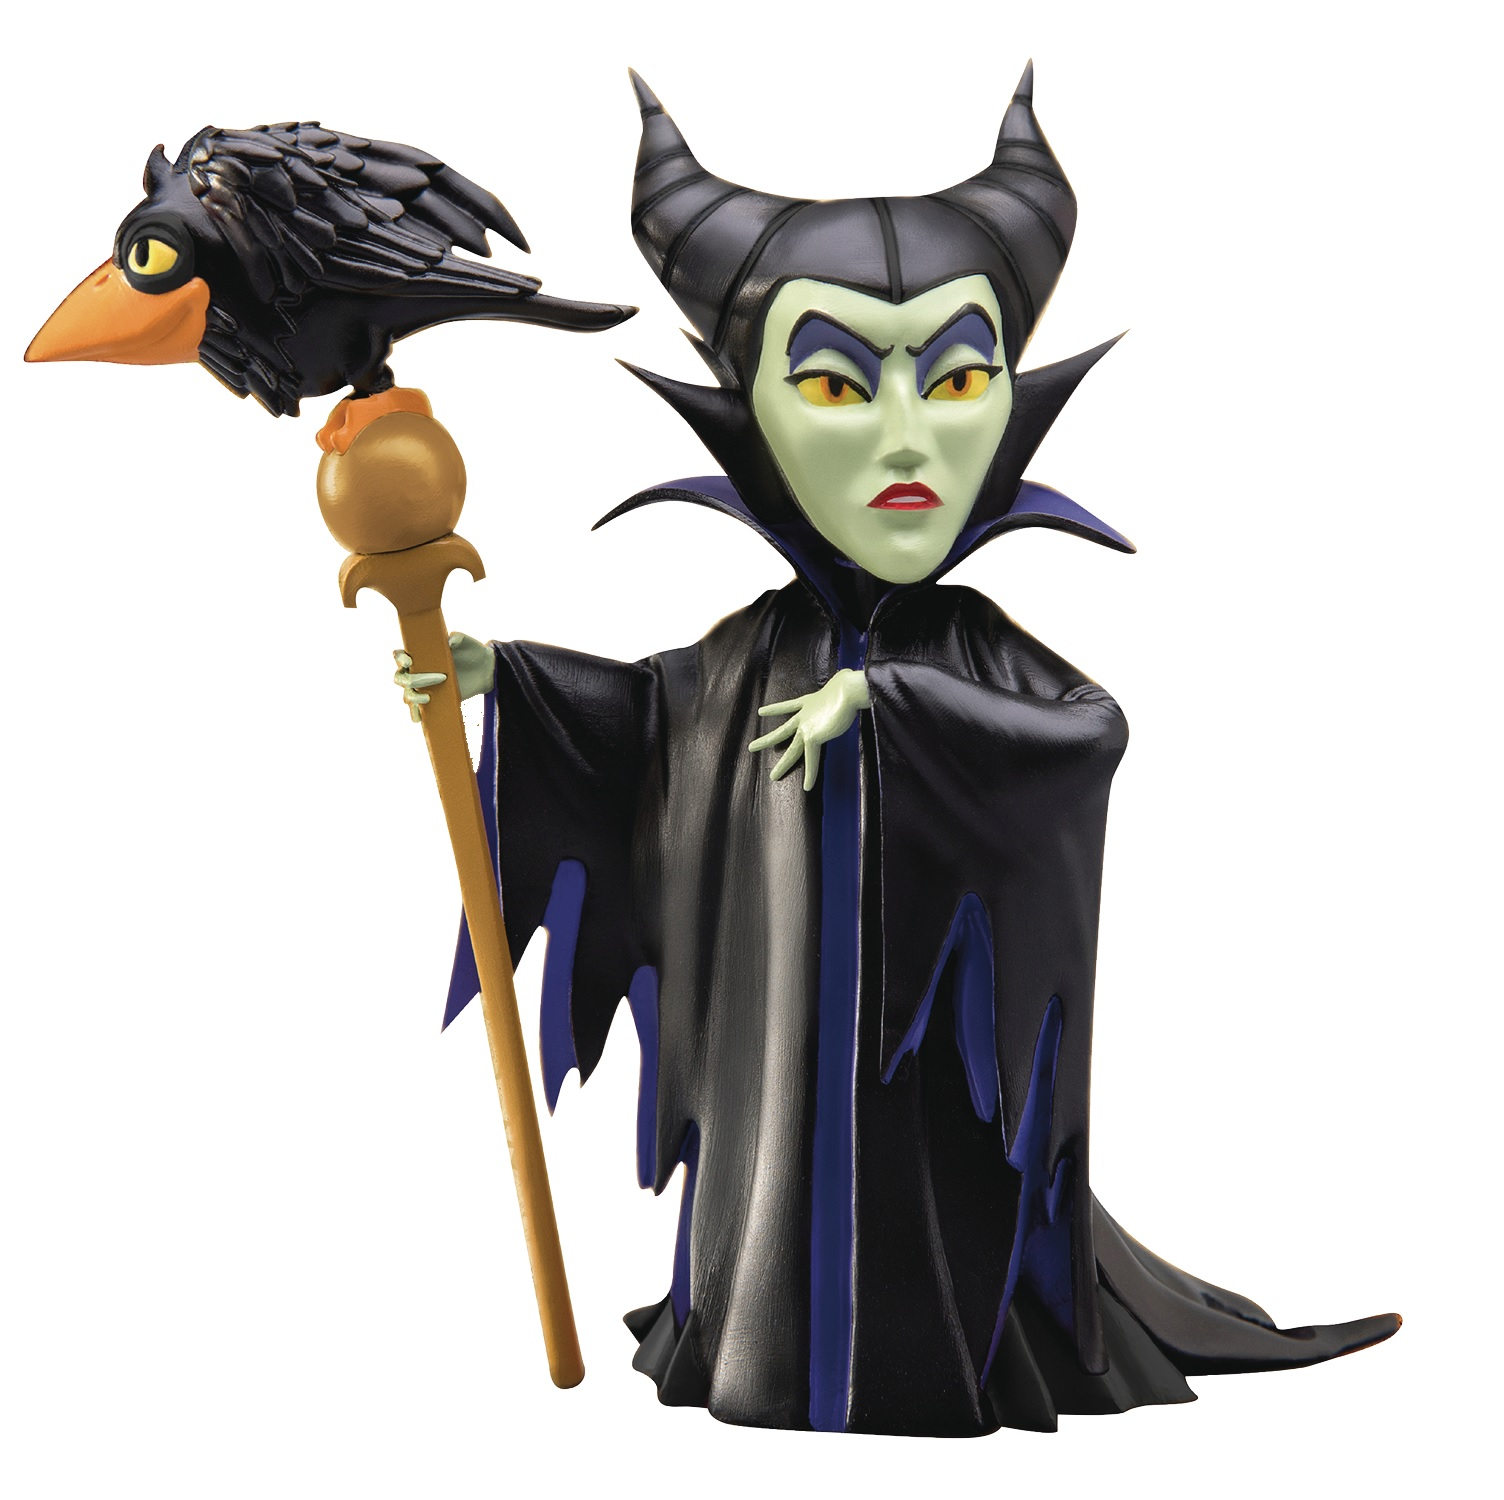 Disney Villains Mini Figure - Maleficent